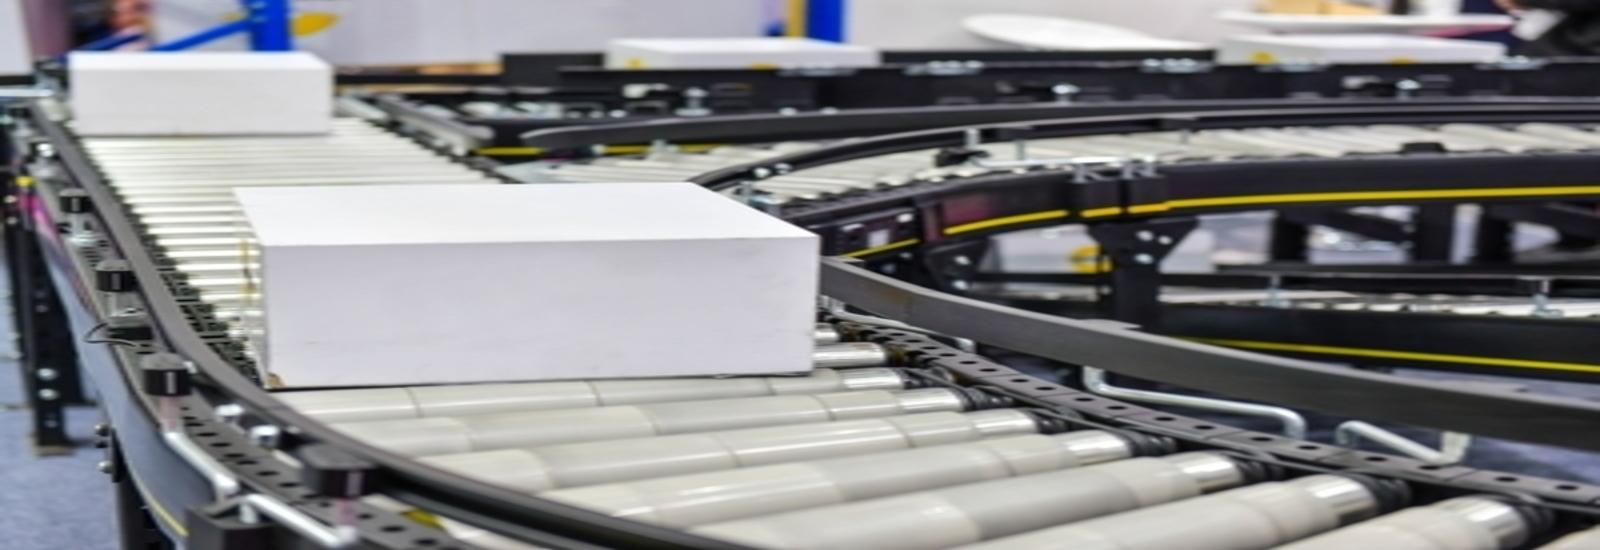 Conveyor scanner load